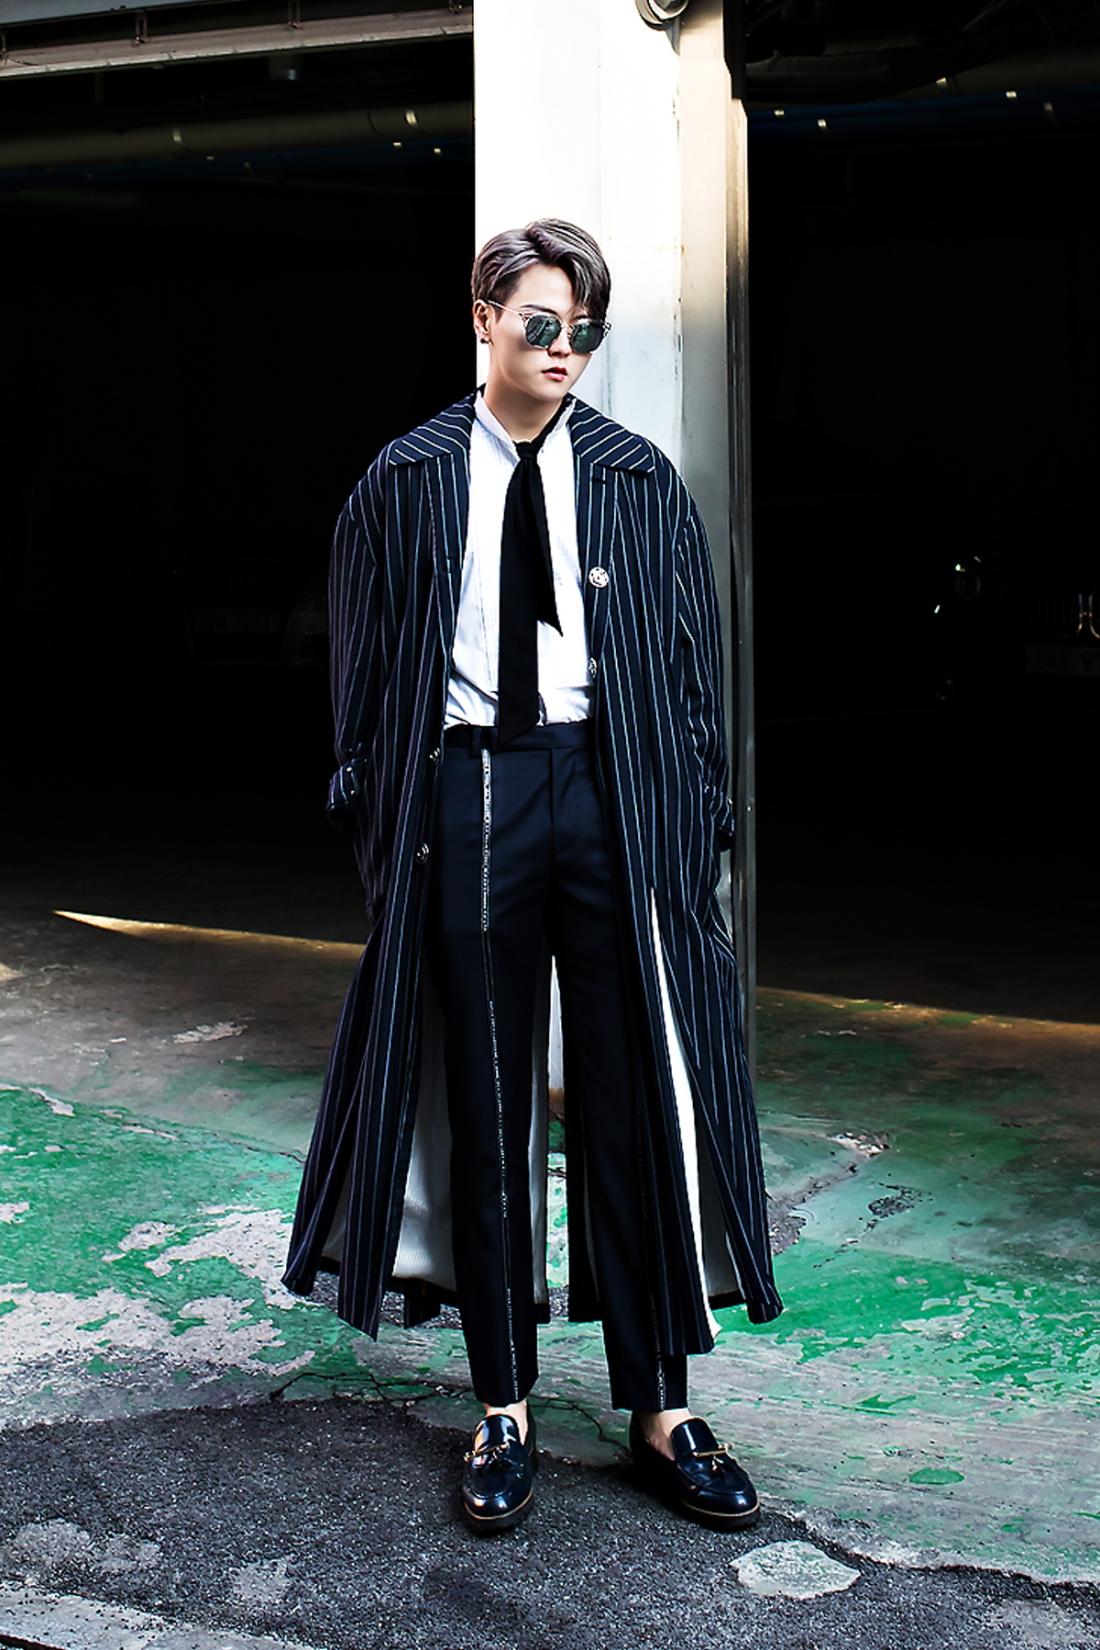 Lee Chun, Street Fashion 2017 in SEOUL.jpg